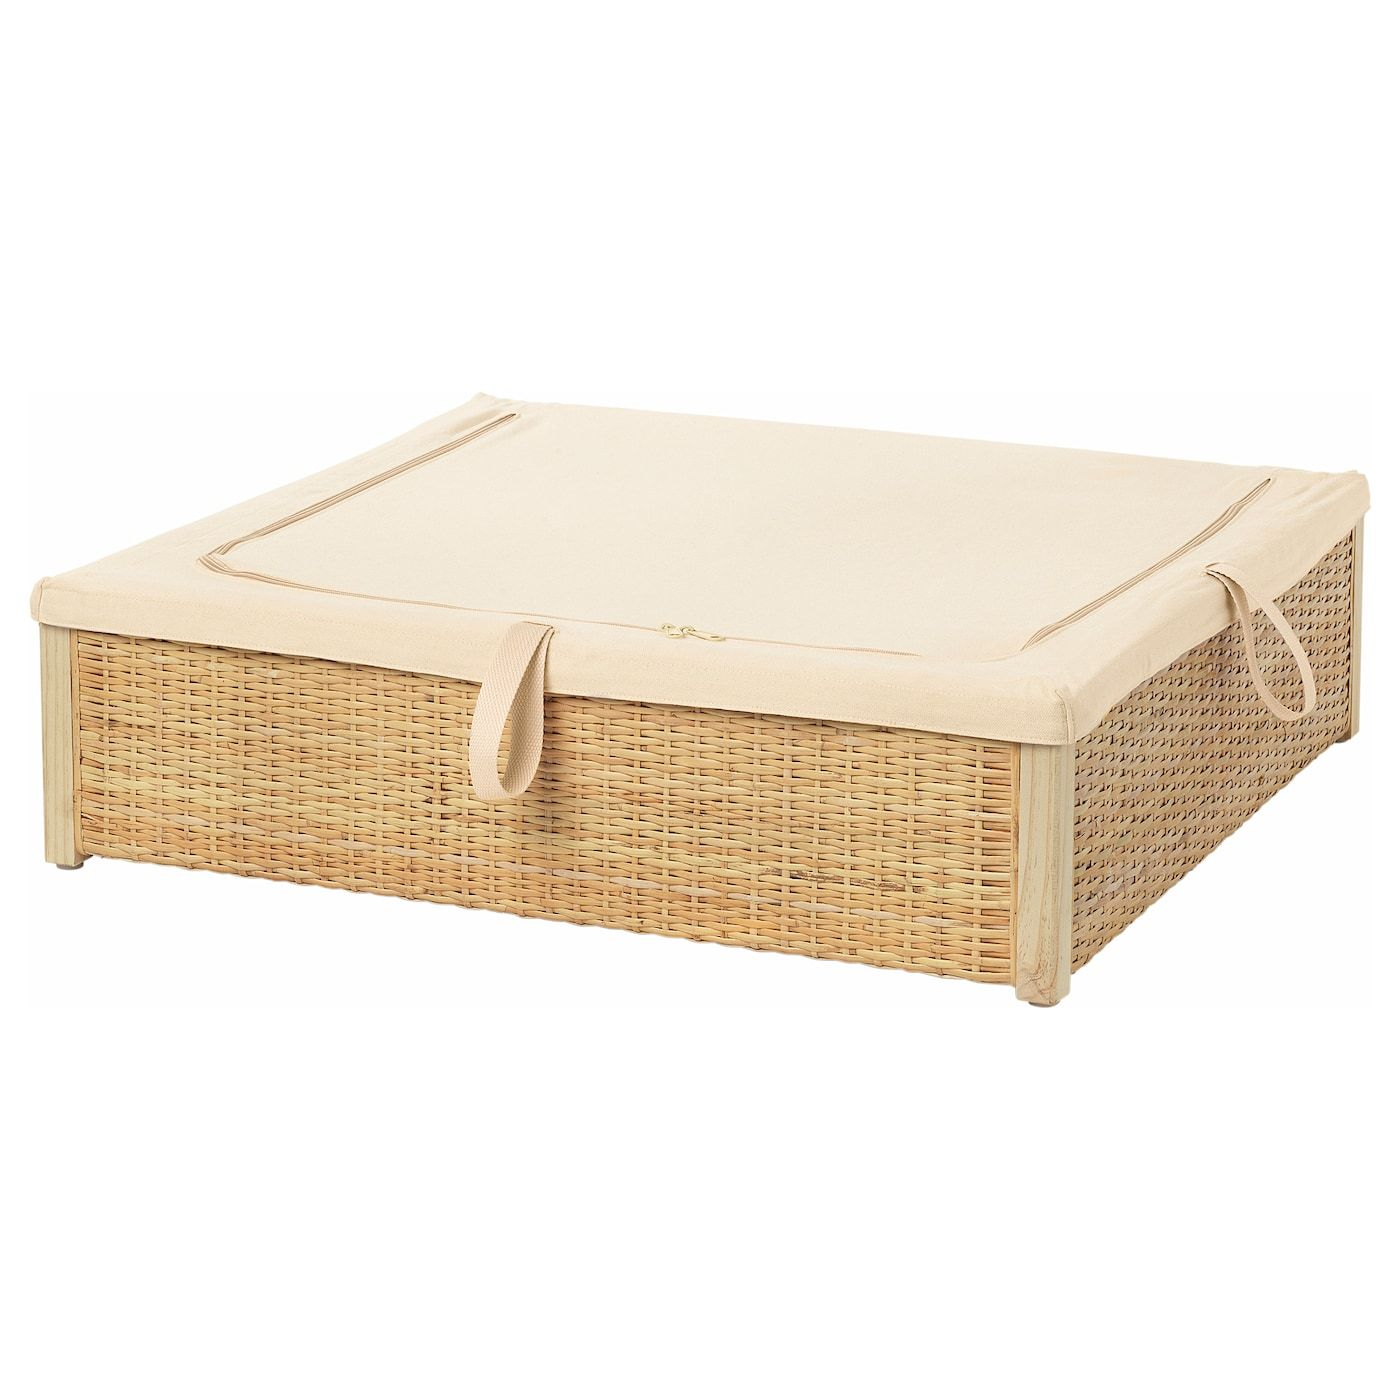 Romskog Bed Storage Box Rattan 65x70 Cm Ikea Ireland En 2020 Rangement En Dessous Du Lit Lit Rotin Lit Rangement